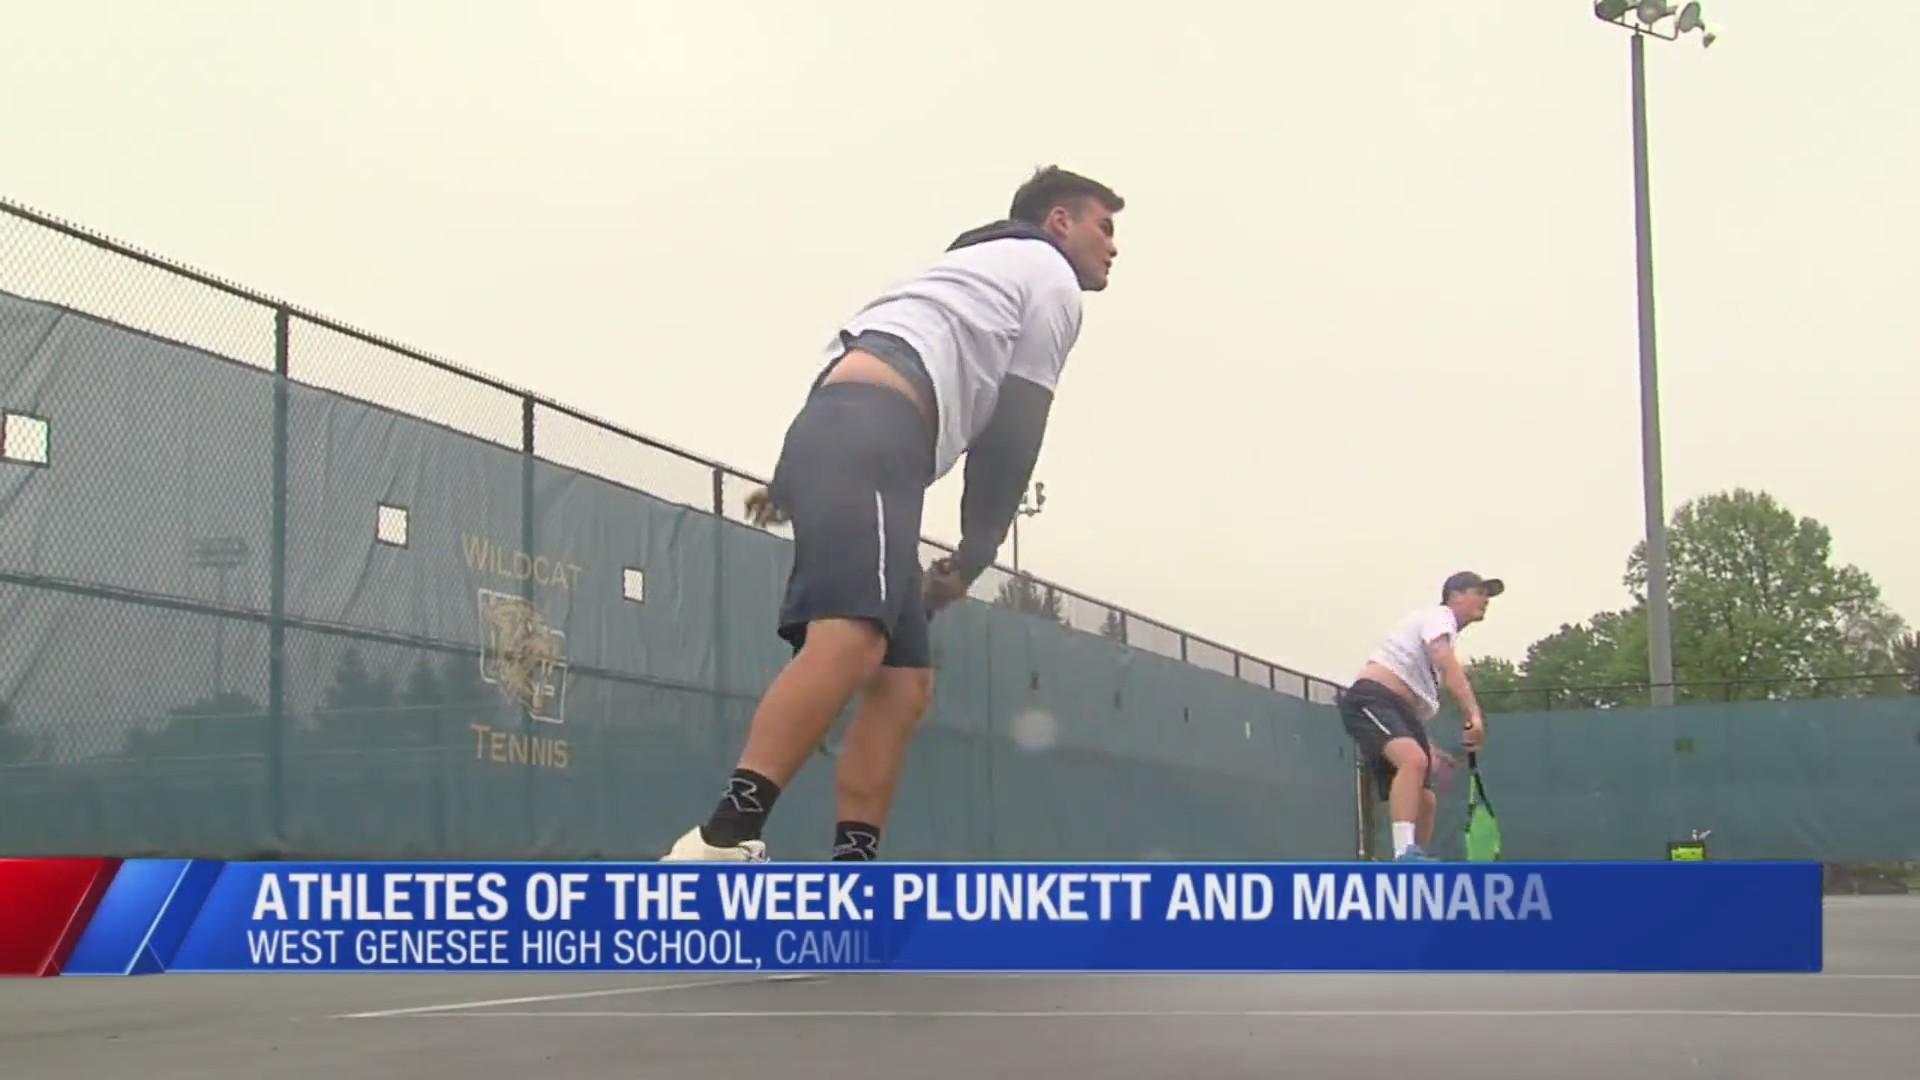 Athlete_s__of_the_Week__James_Plunkett___0_20190605223547